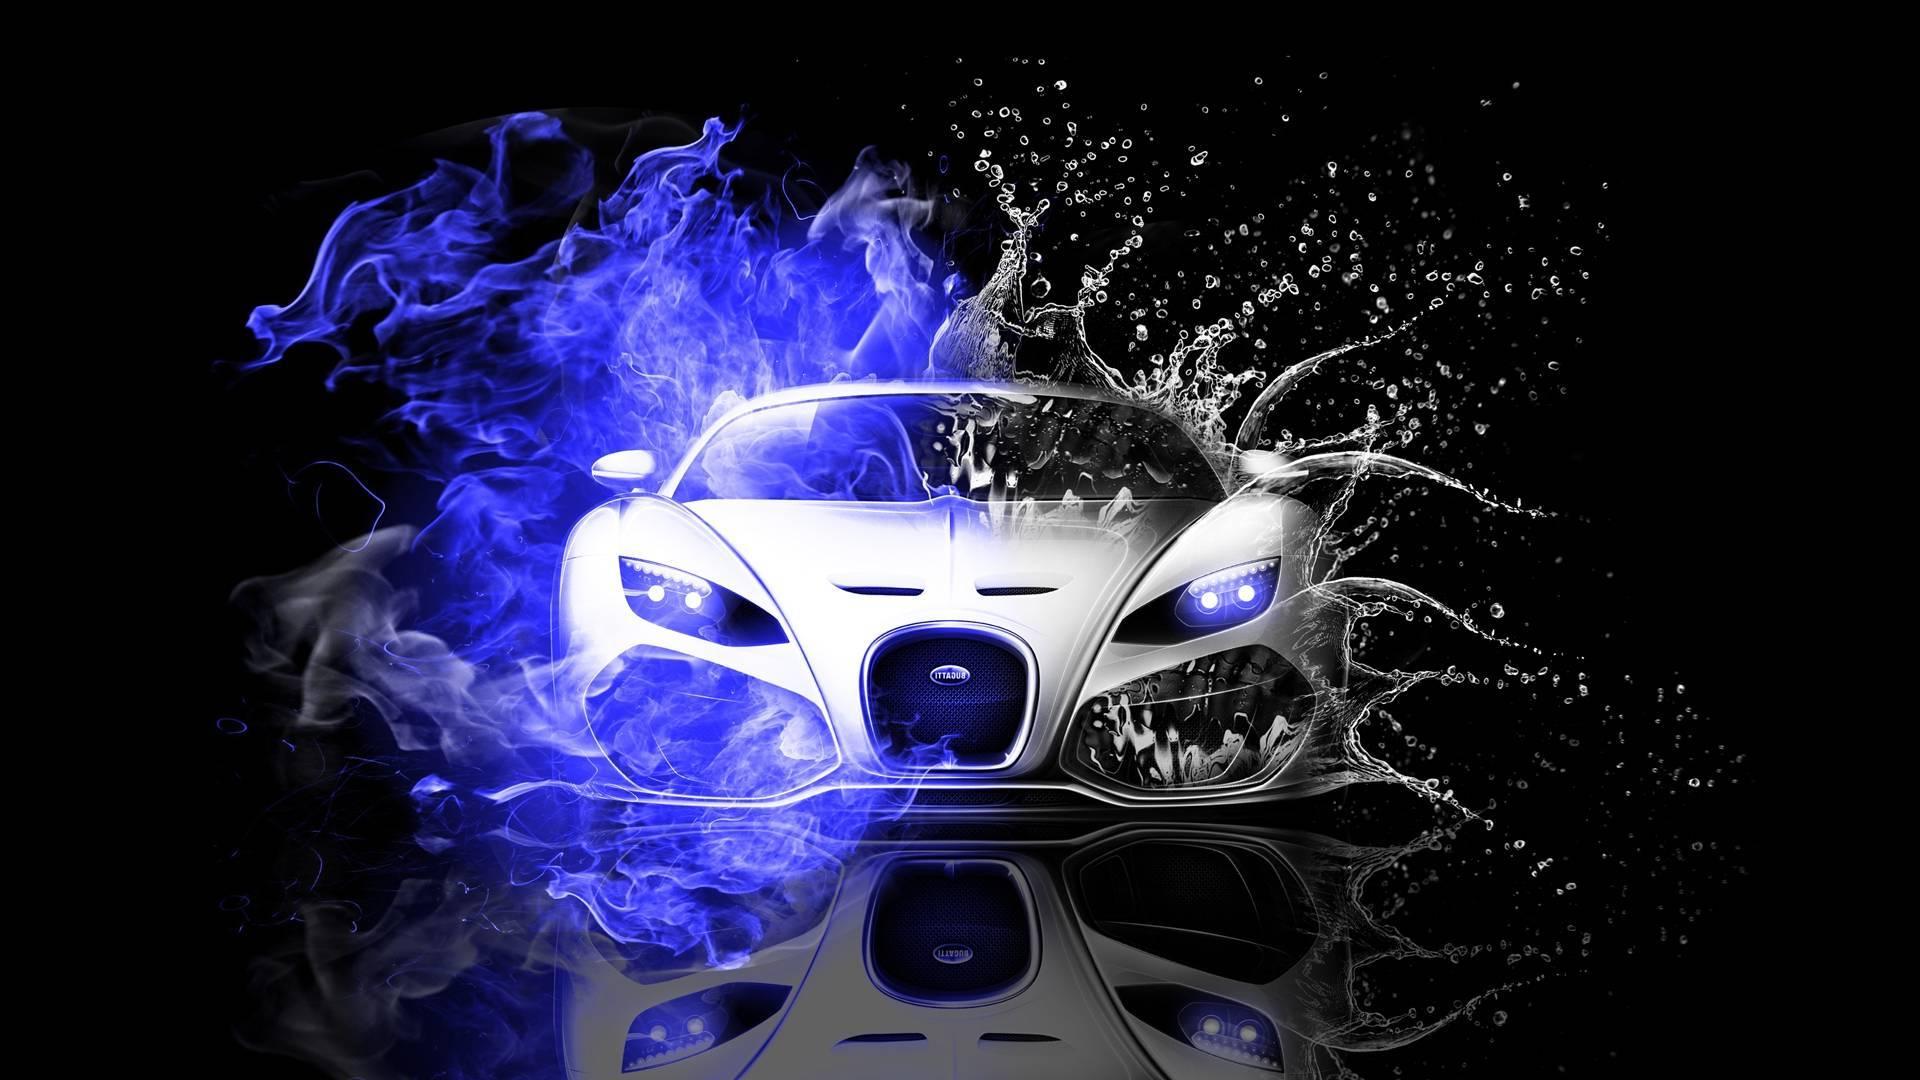 hd bugatti wallpapers for free download - Bugatti Veyron Wallpaper